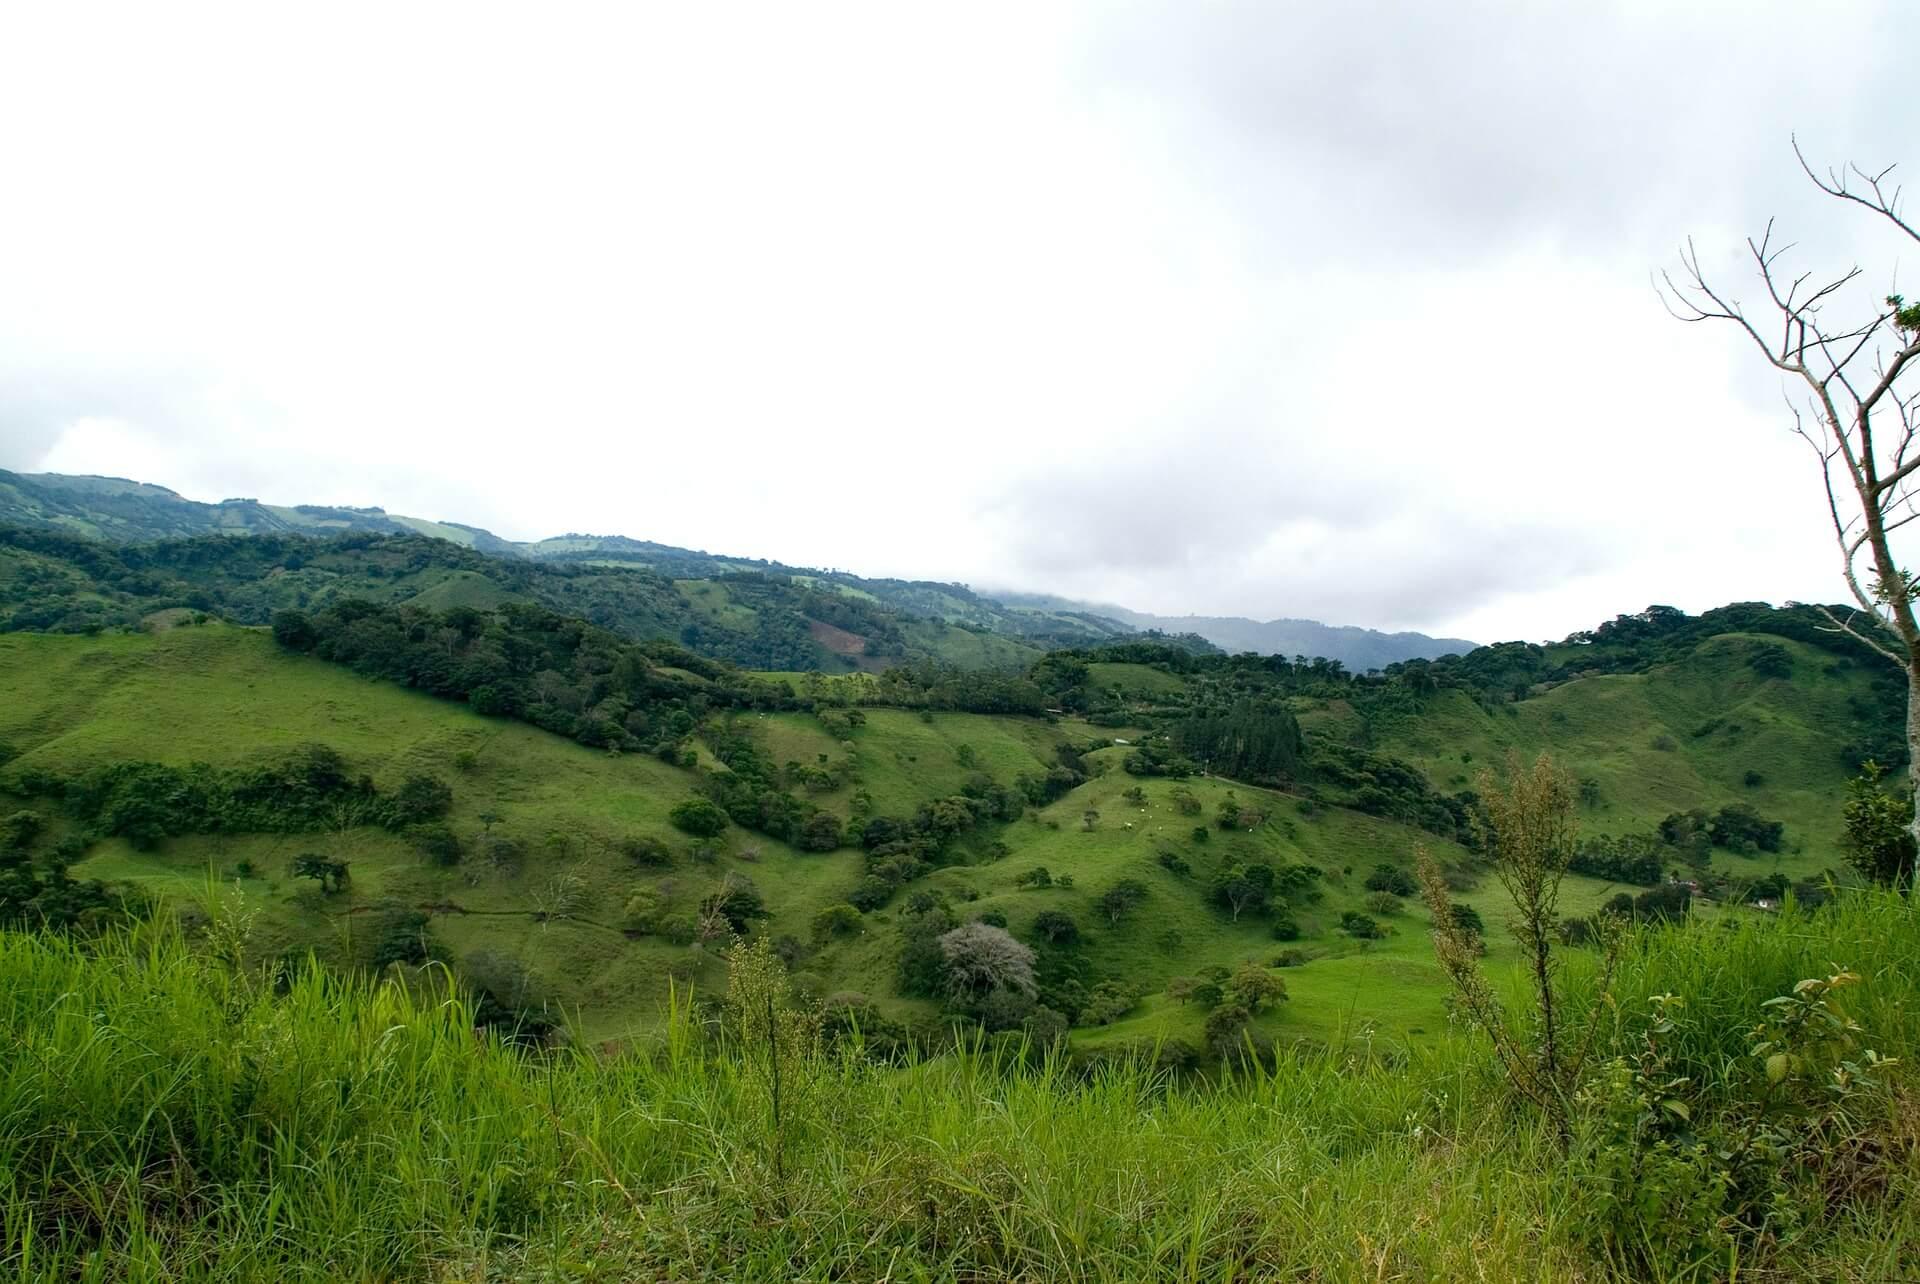 Merveilles naturelles du Costa Rica